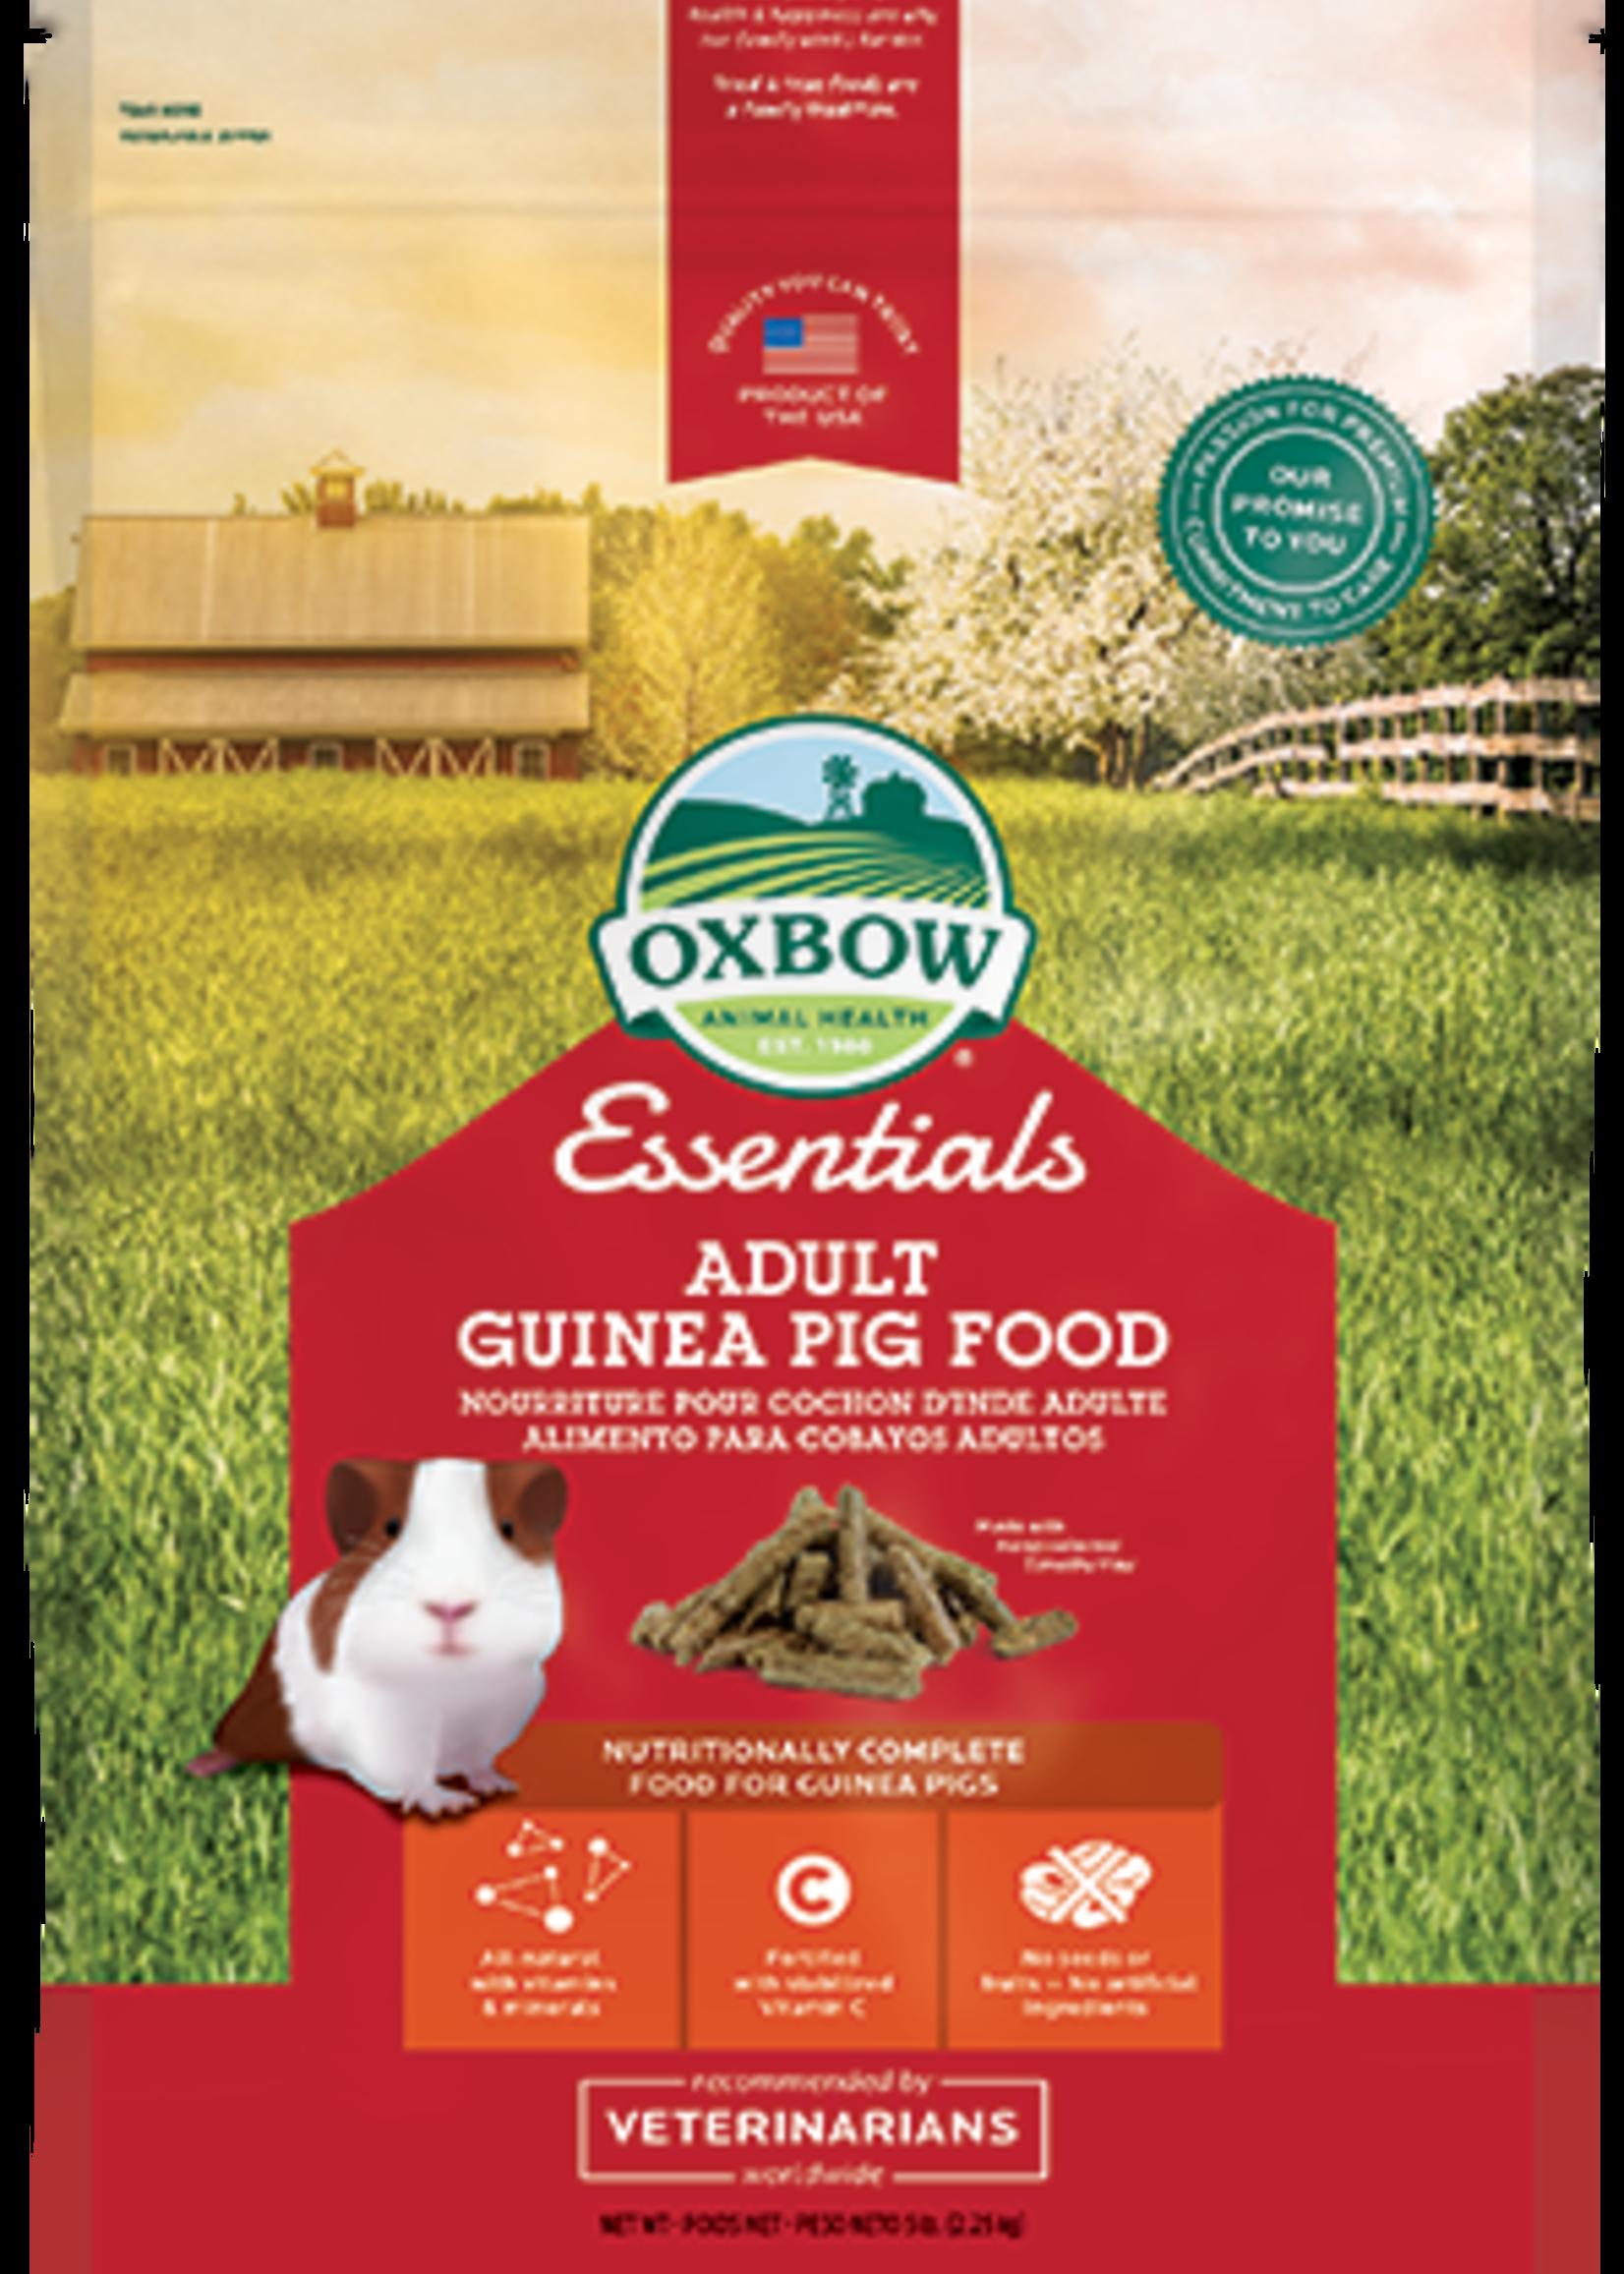 Oxbow Animal Health™ OXBOW ESSENTIALS ADULT GUINEA PIG 5lbs